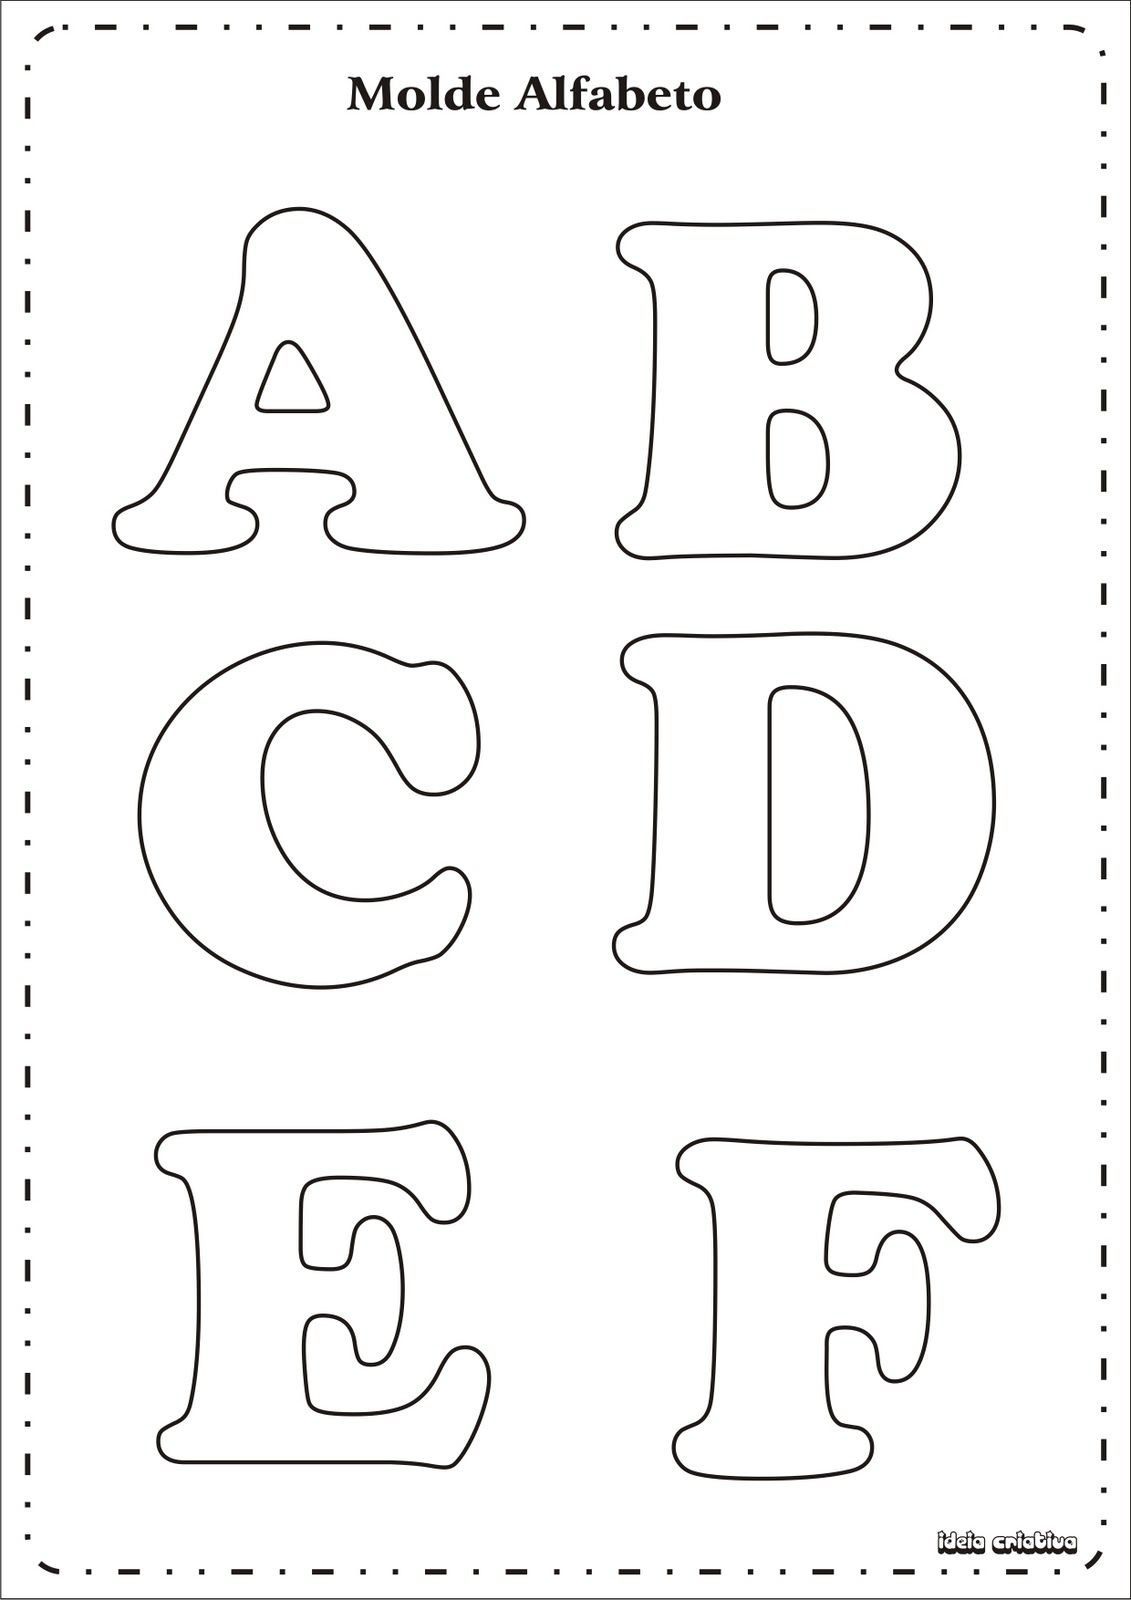 Pin de carmen martin en alfabetos | Pinterest | Alfabeto, Eva y Molde